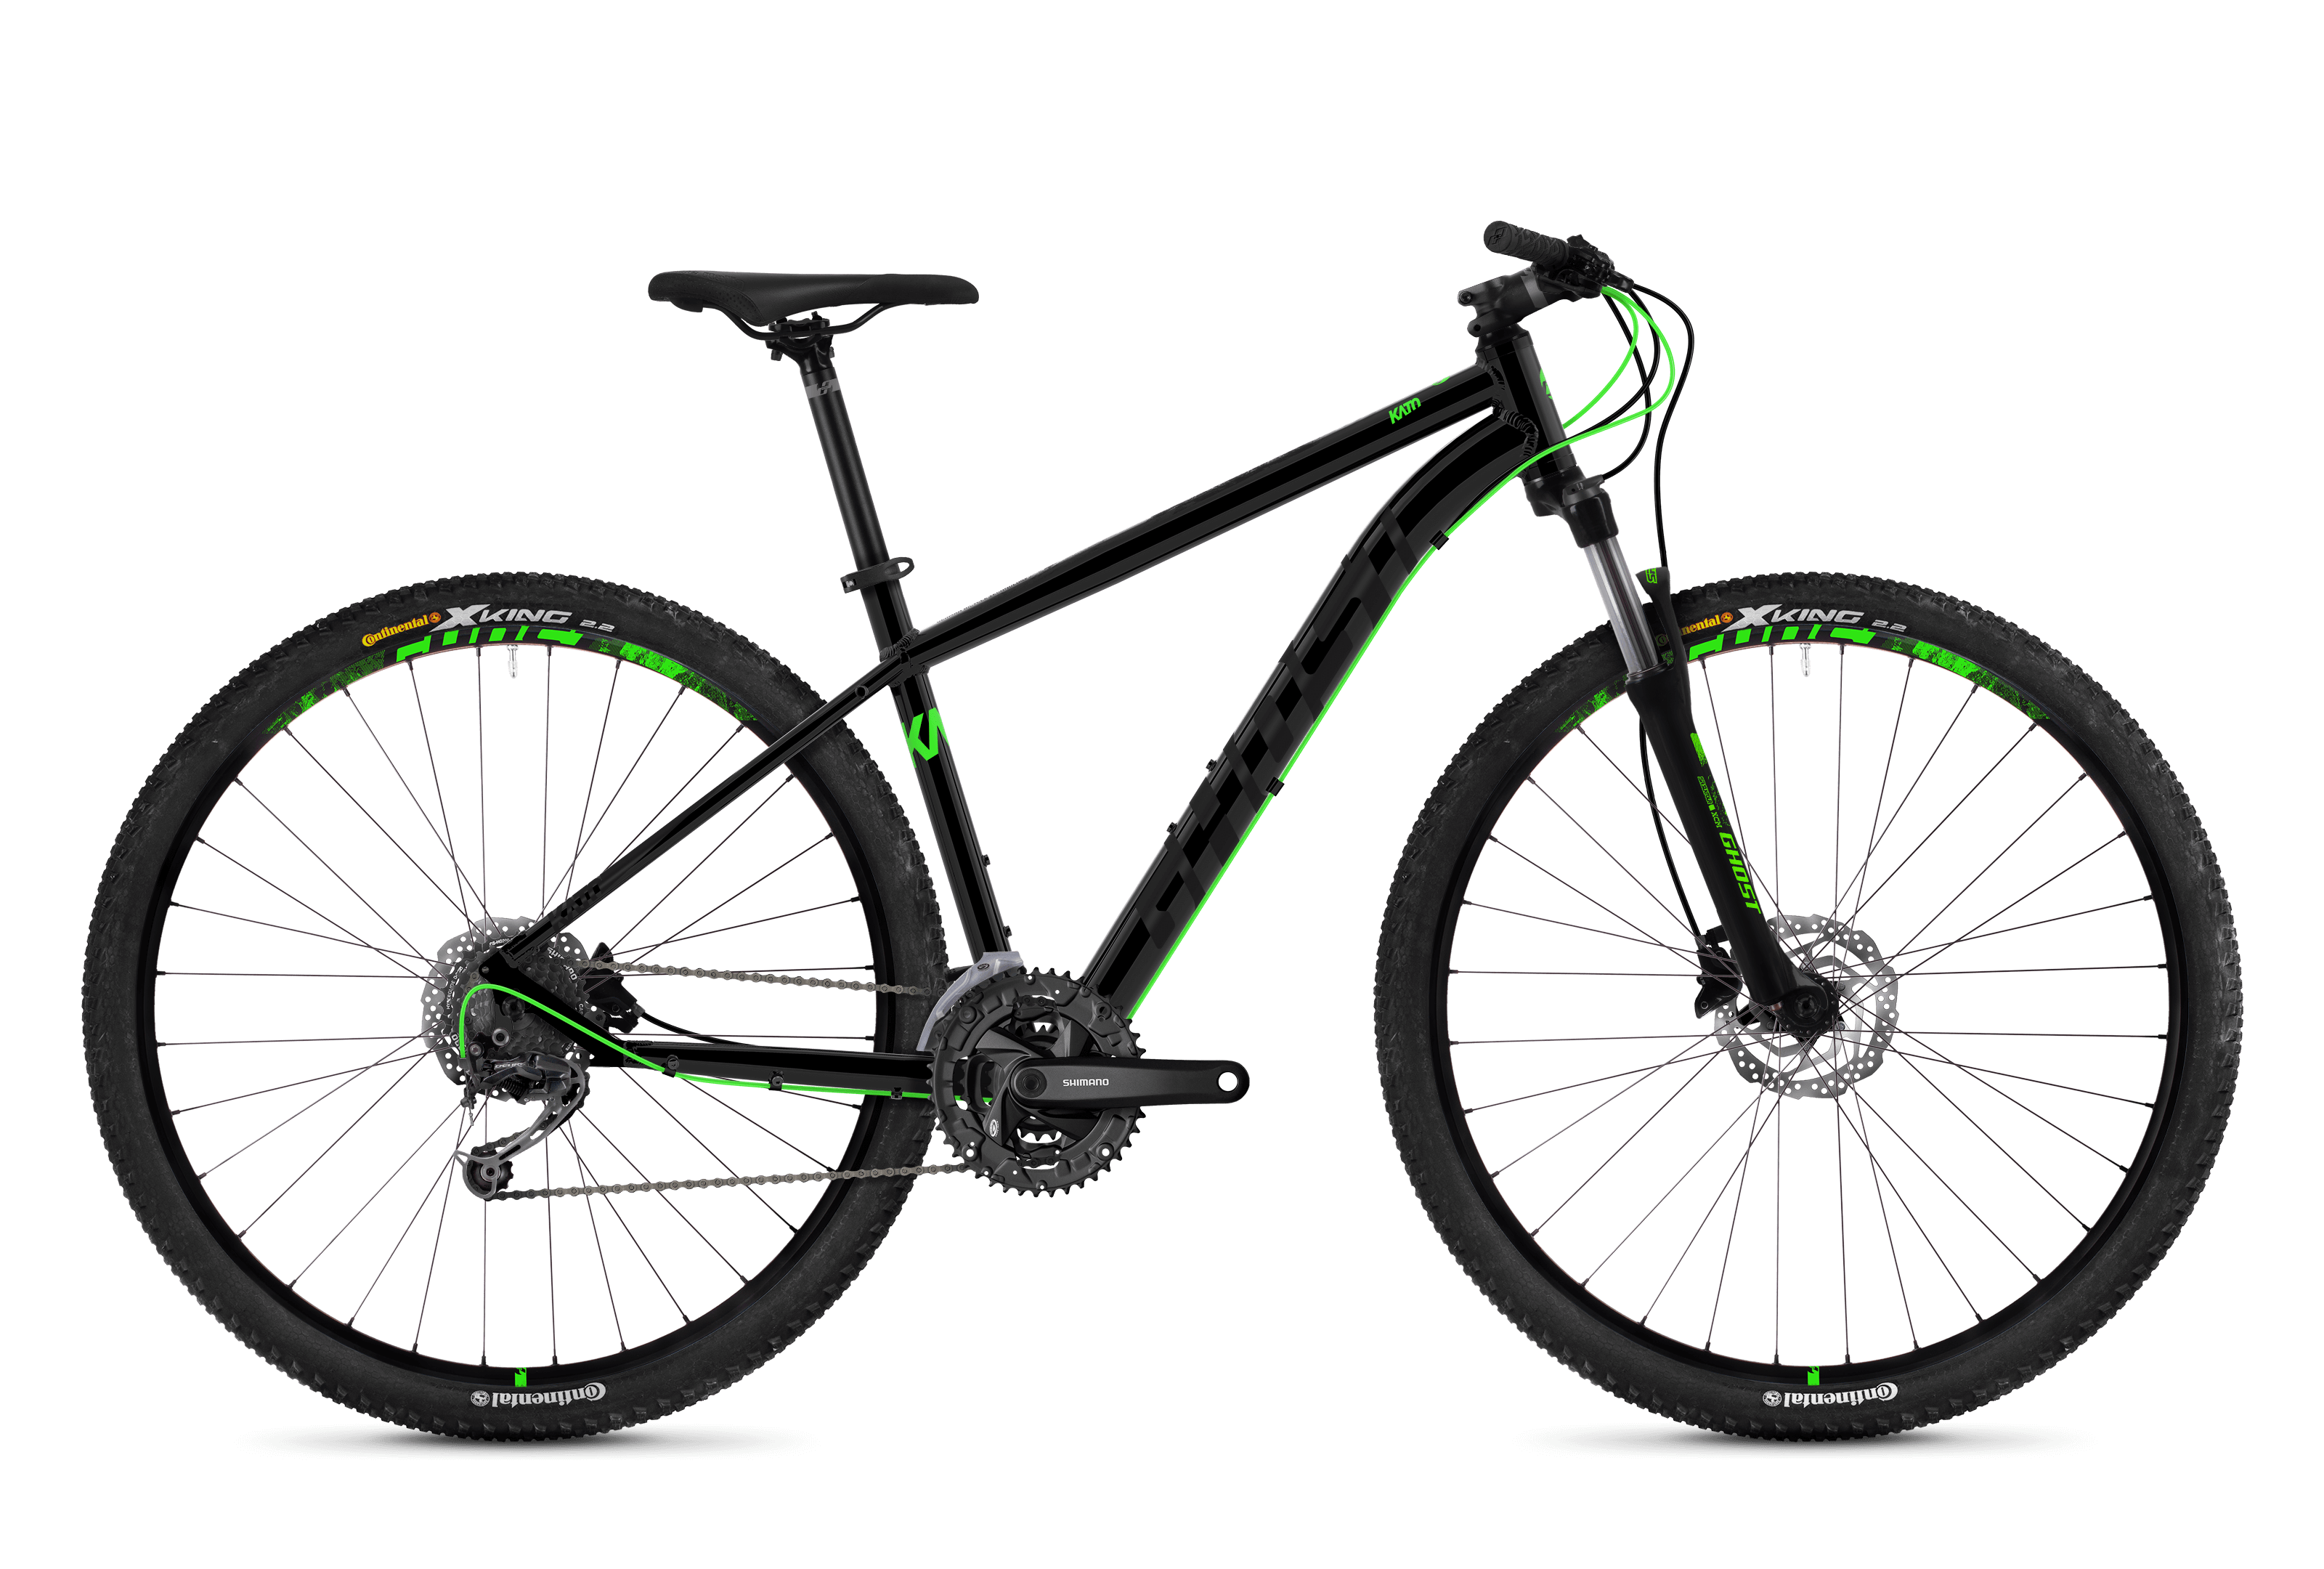 Horské kolo GHOST Kato 4.9 black / green L 2018